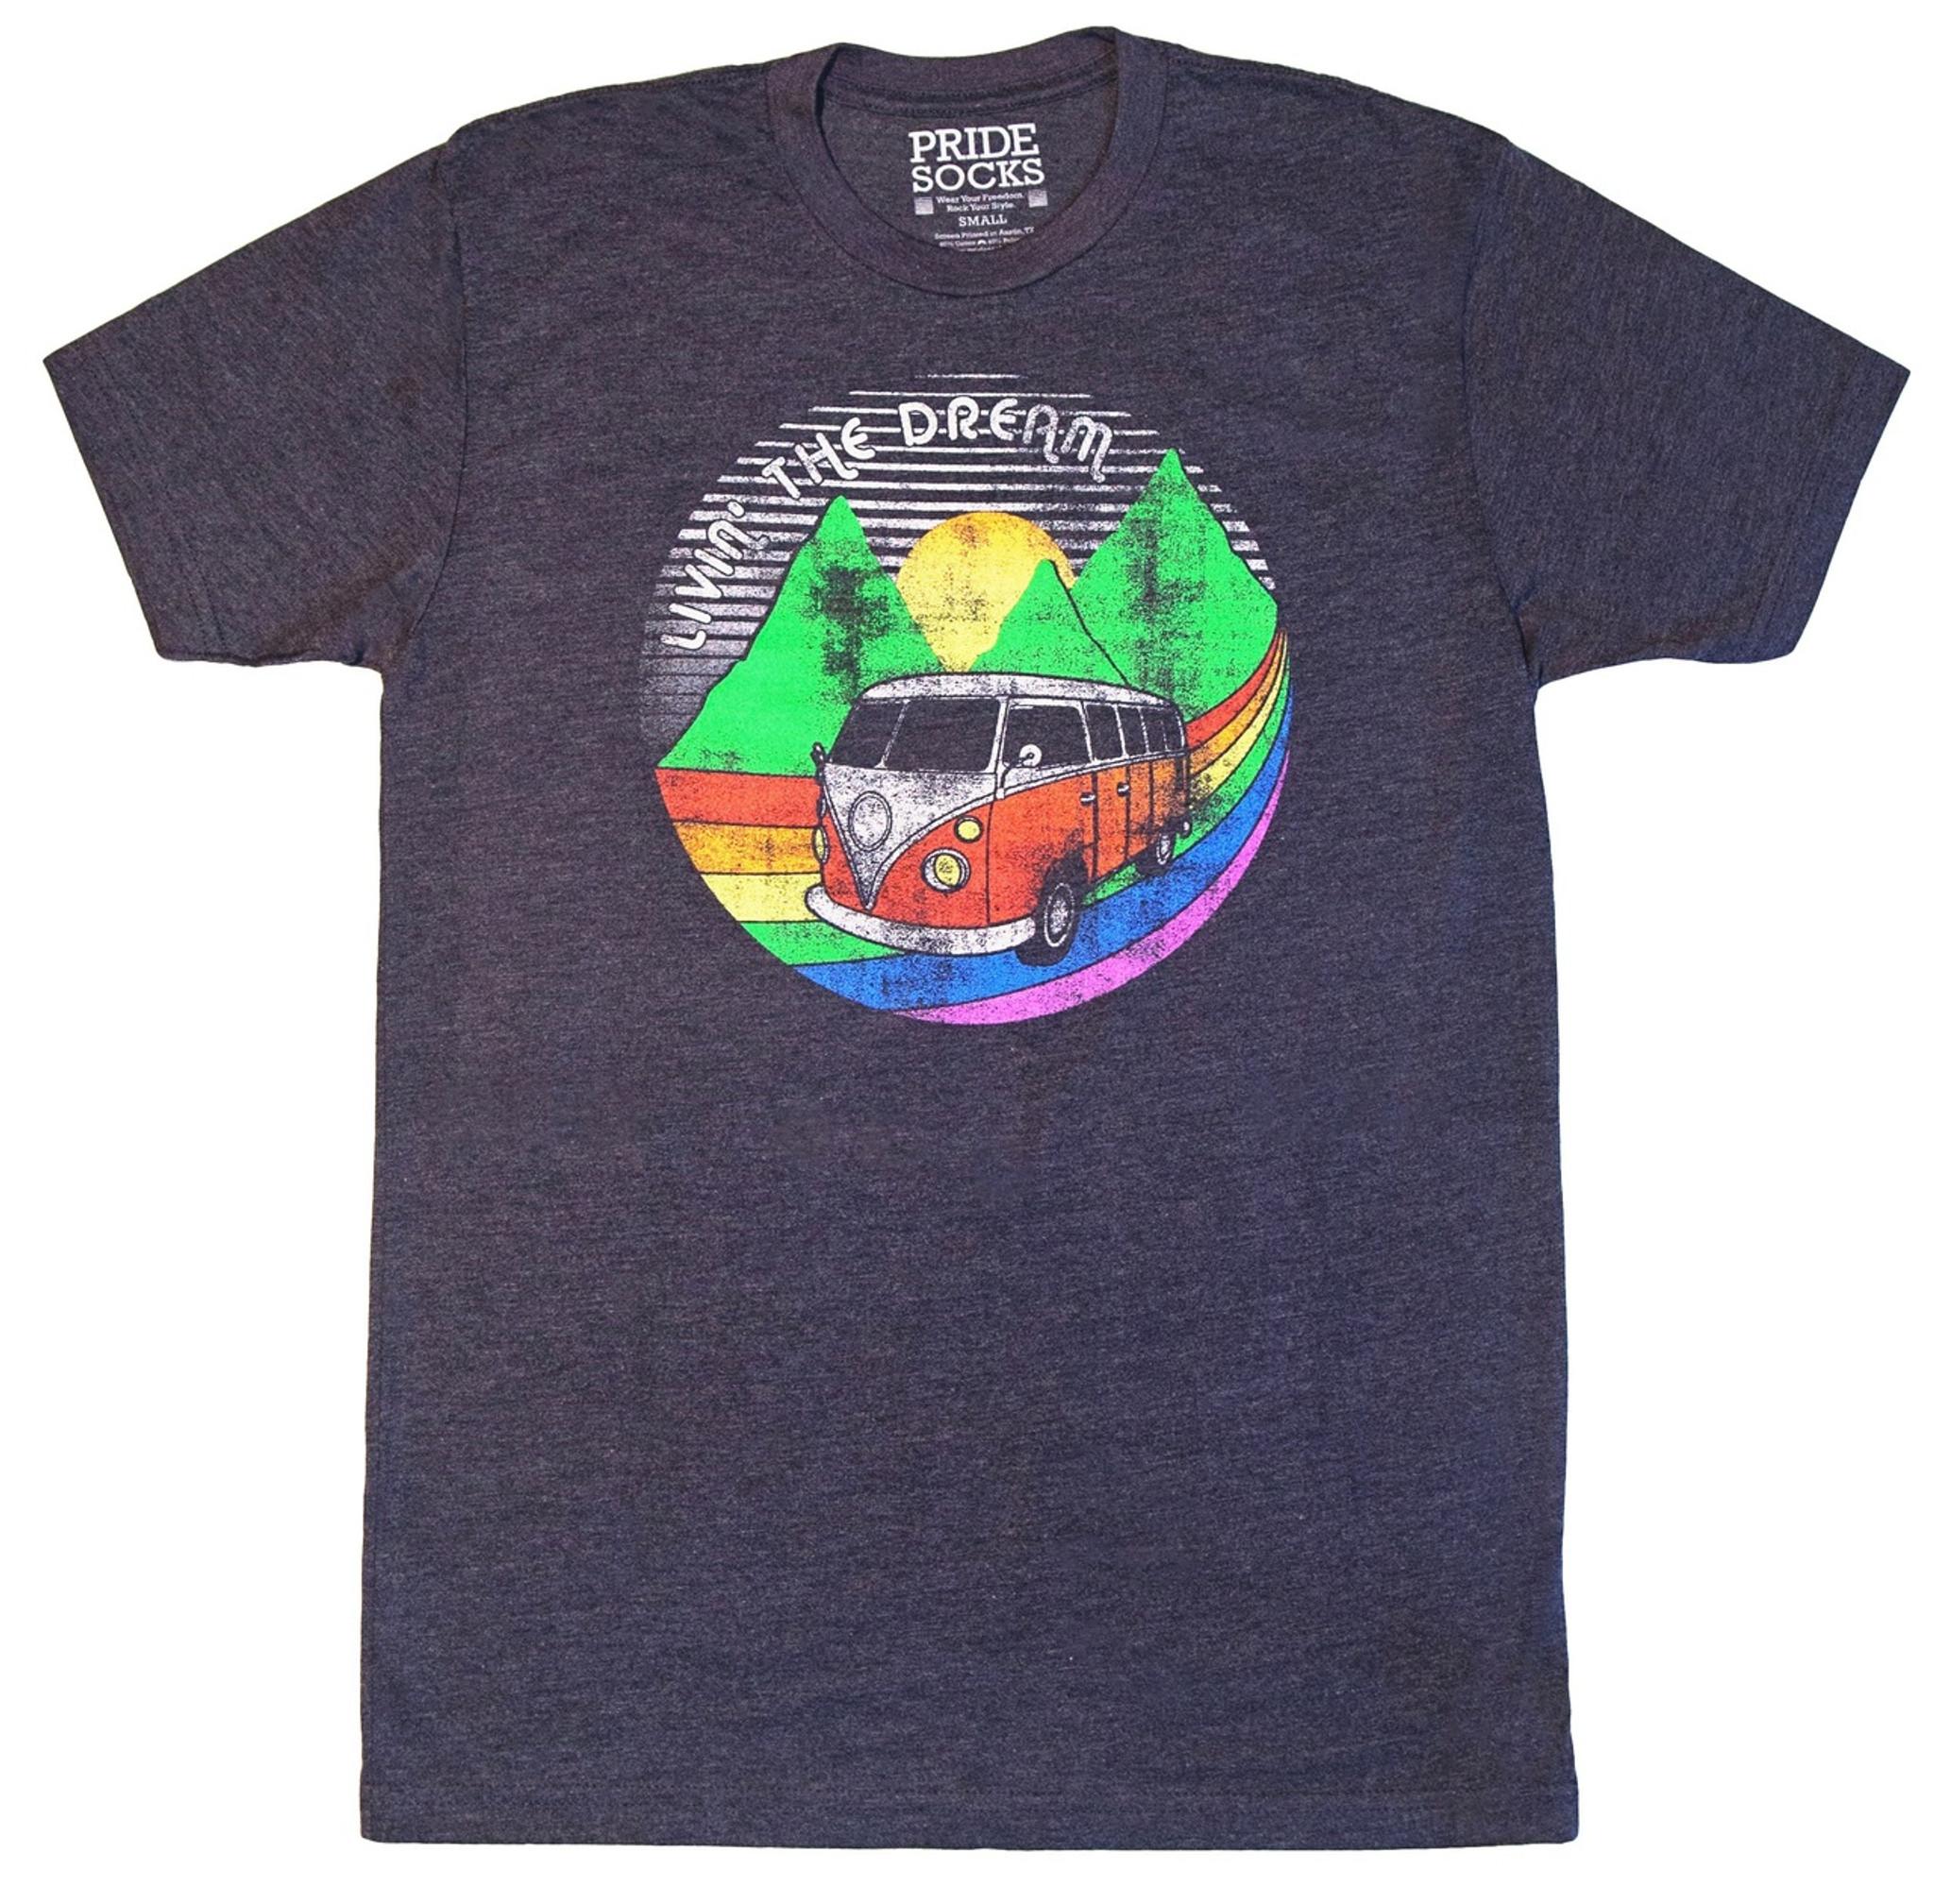 3e82ab2135 living the dream with prides socks rainbow themed retro shirts.